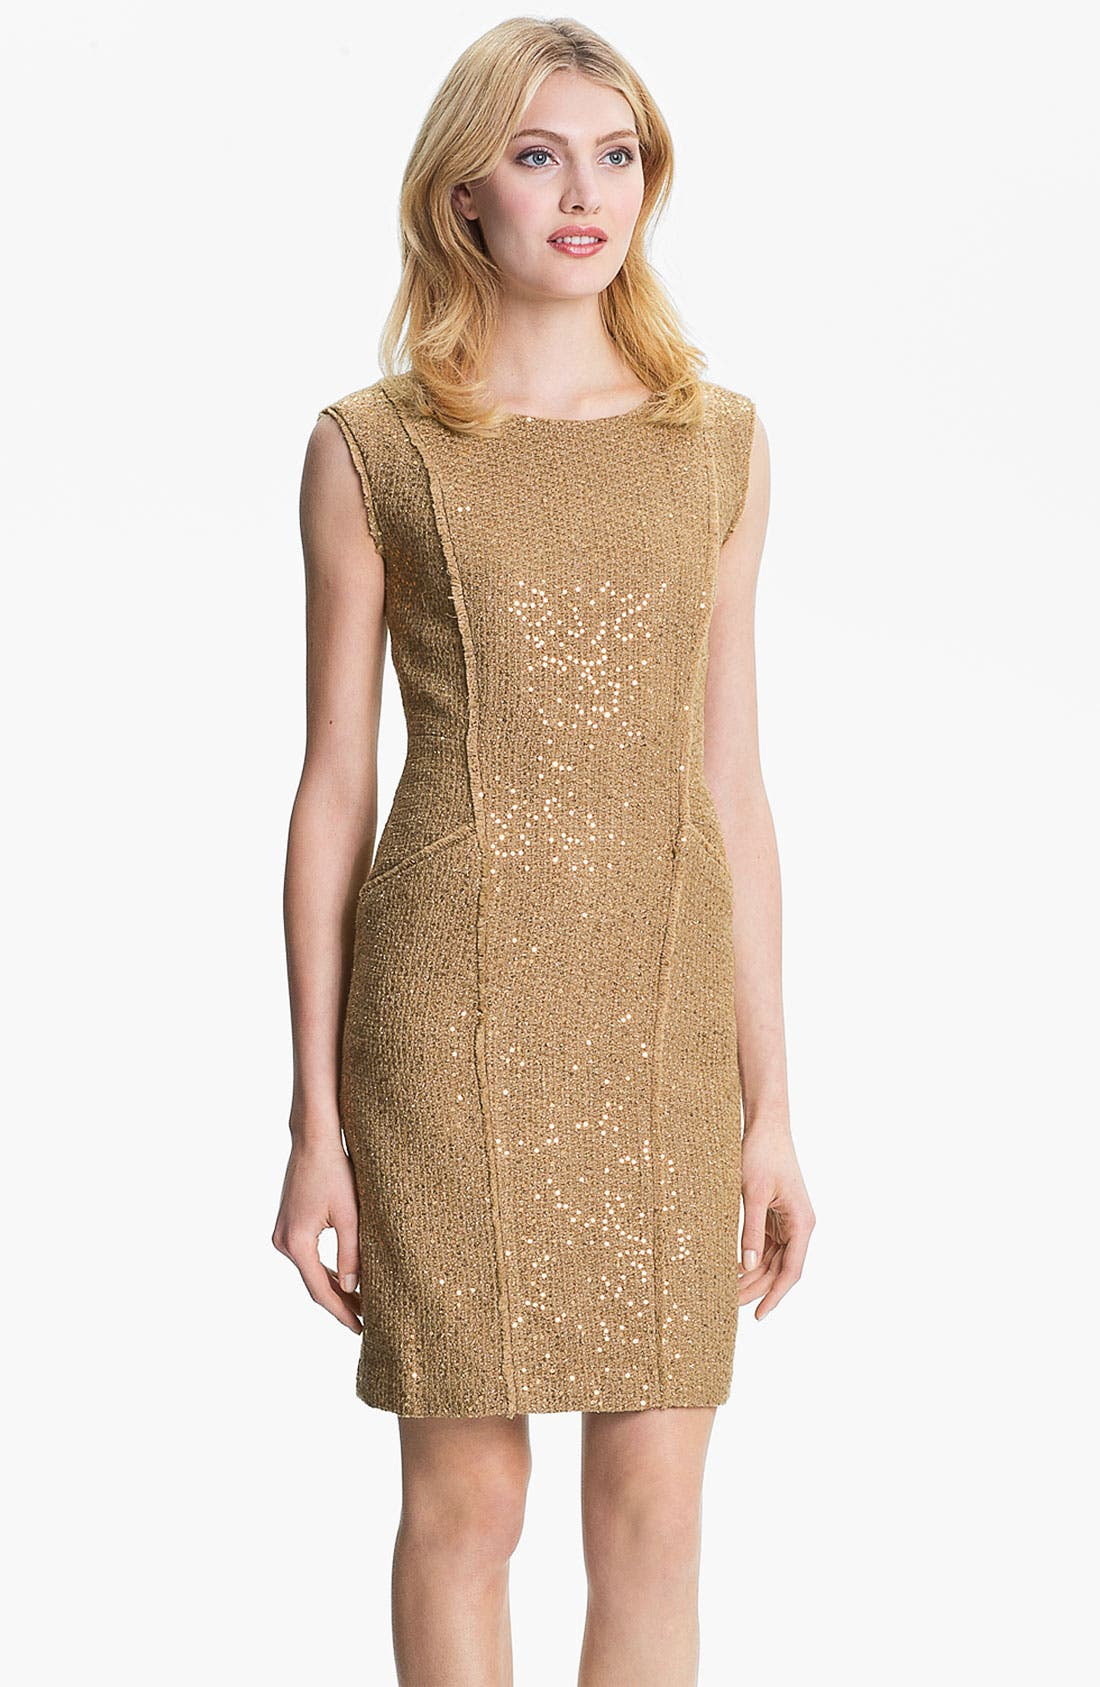 Alternate Image 1 Selected - MICHAEL Michael Kors Fray Edge Sheath Dress (Petite)